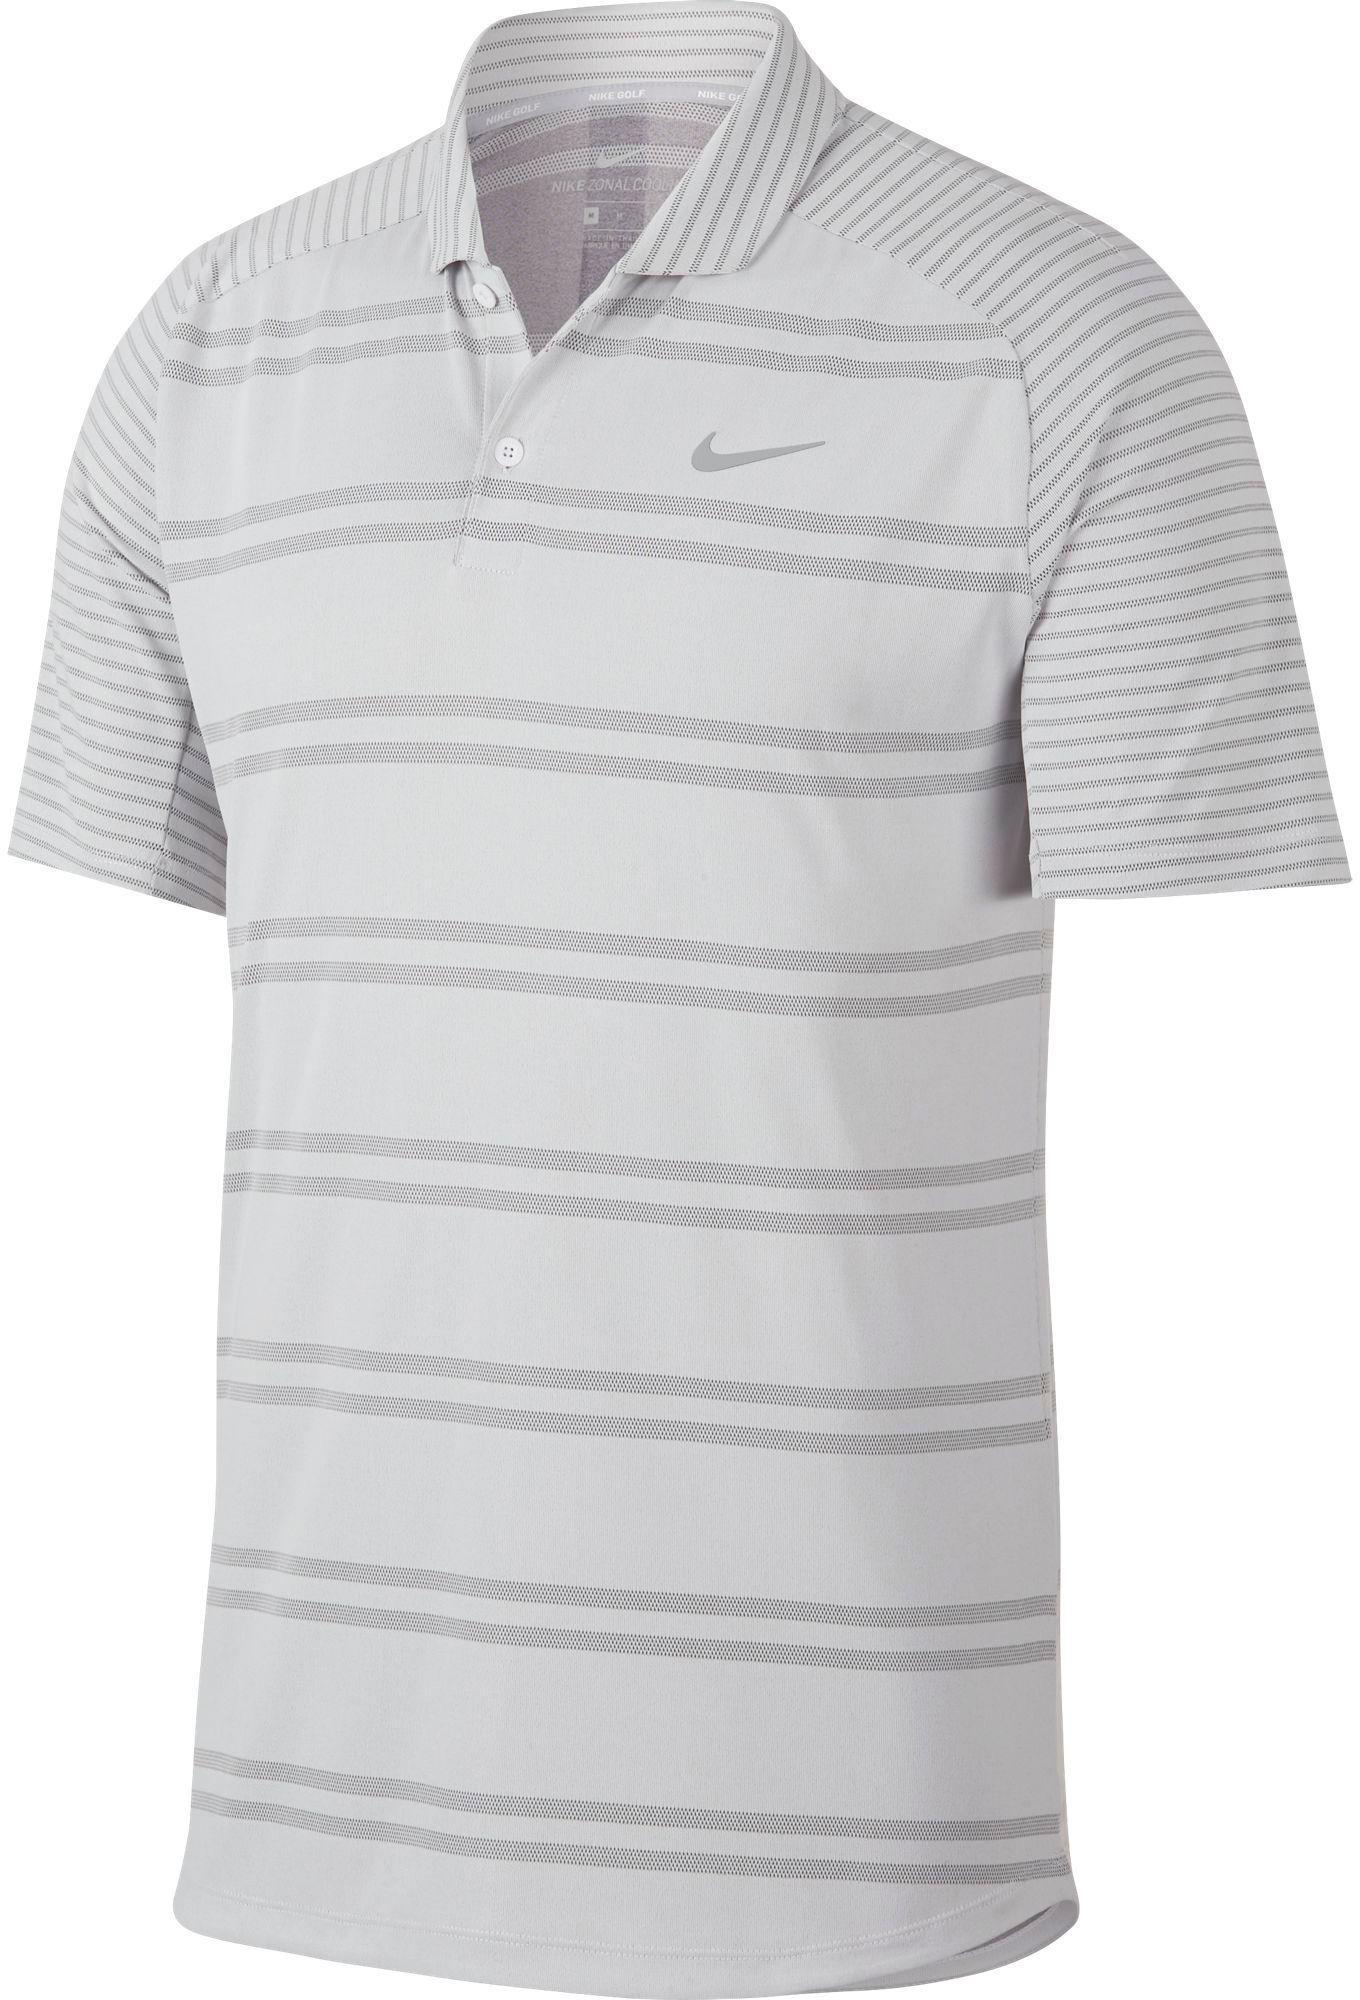 e773ff21 Lyst - Nike Zonal Cooling Stripe Raglan Golf Polo in White for Men